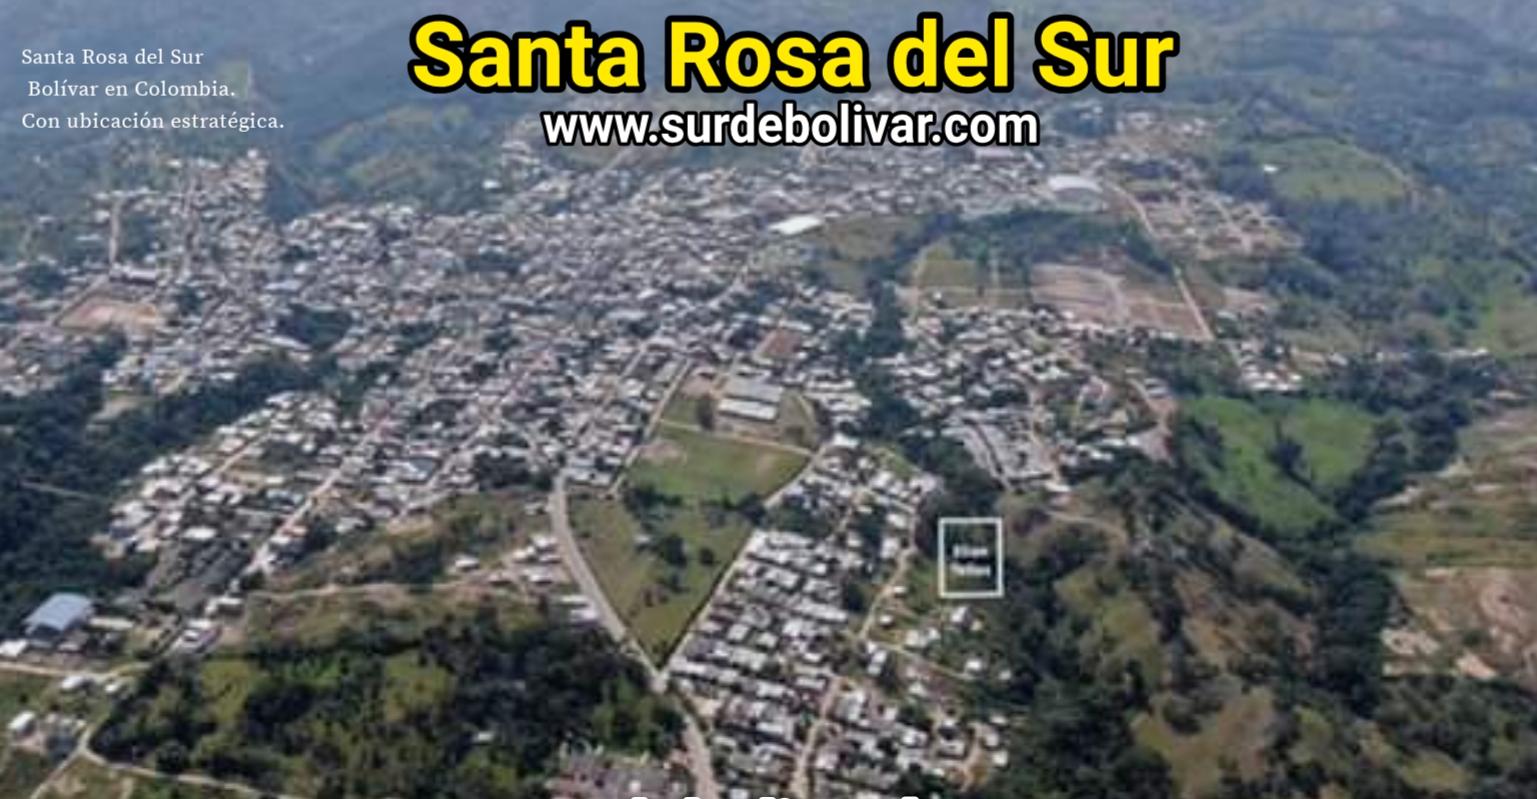 Municipio de Santa Rosa del Sur - Sur de